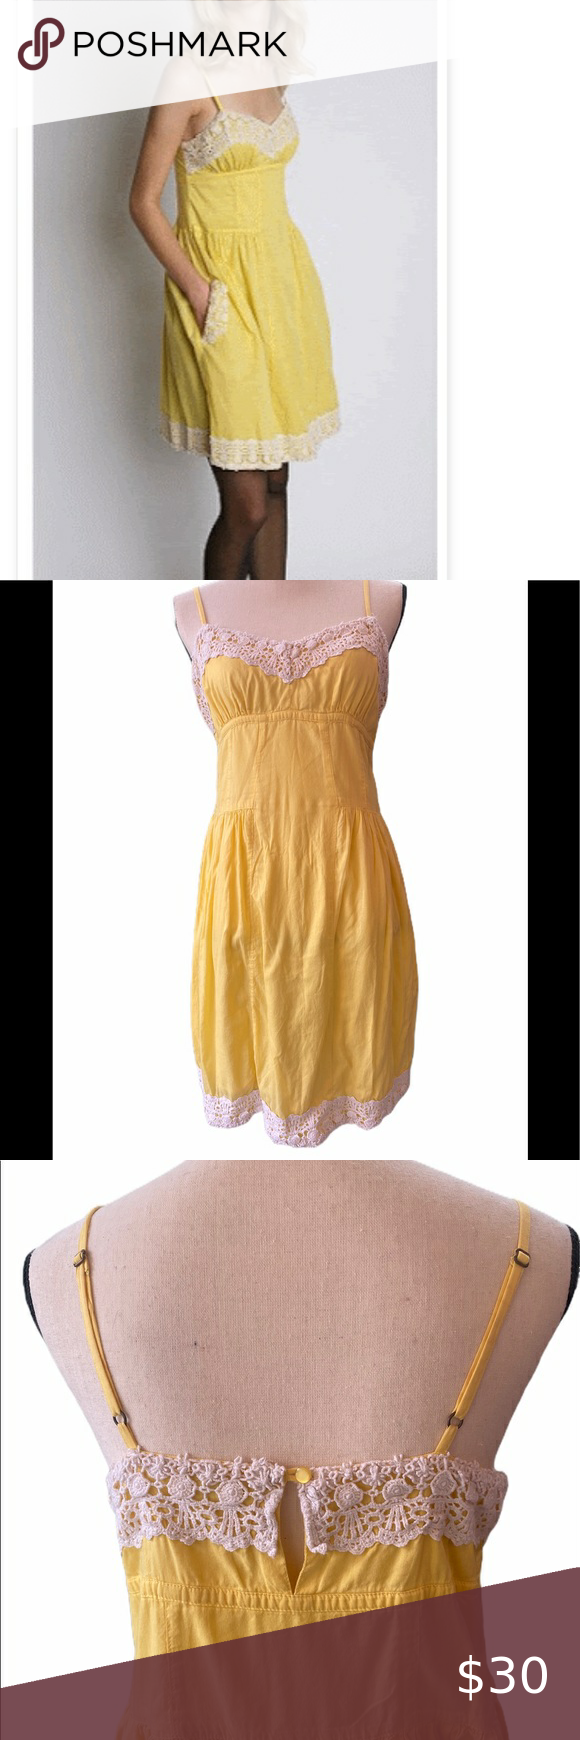 Kimchi Blue Tenerife Dress Blue And Yellow Dress Kimchi Blue Blue Midi Dress [ 1740 x 580 Pixel ]